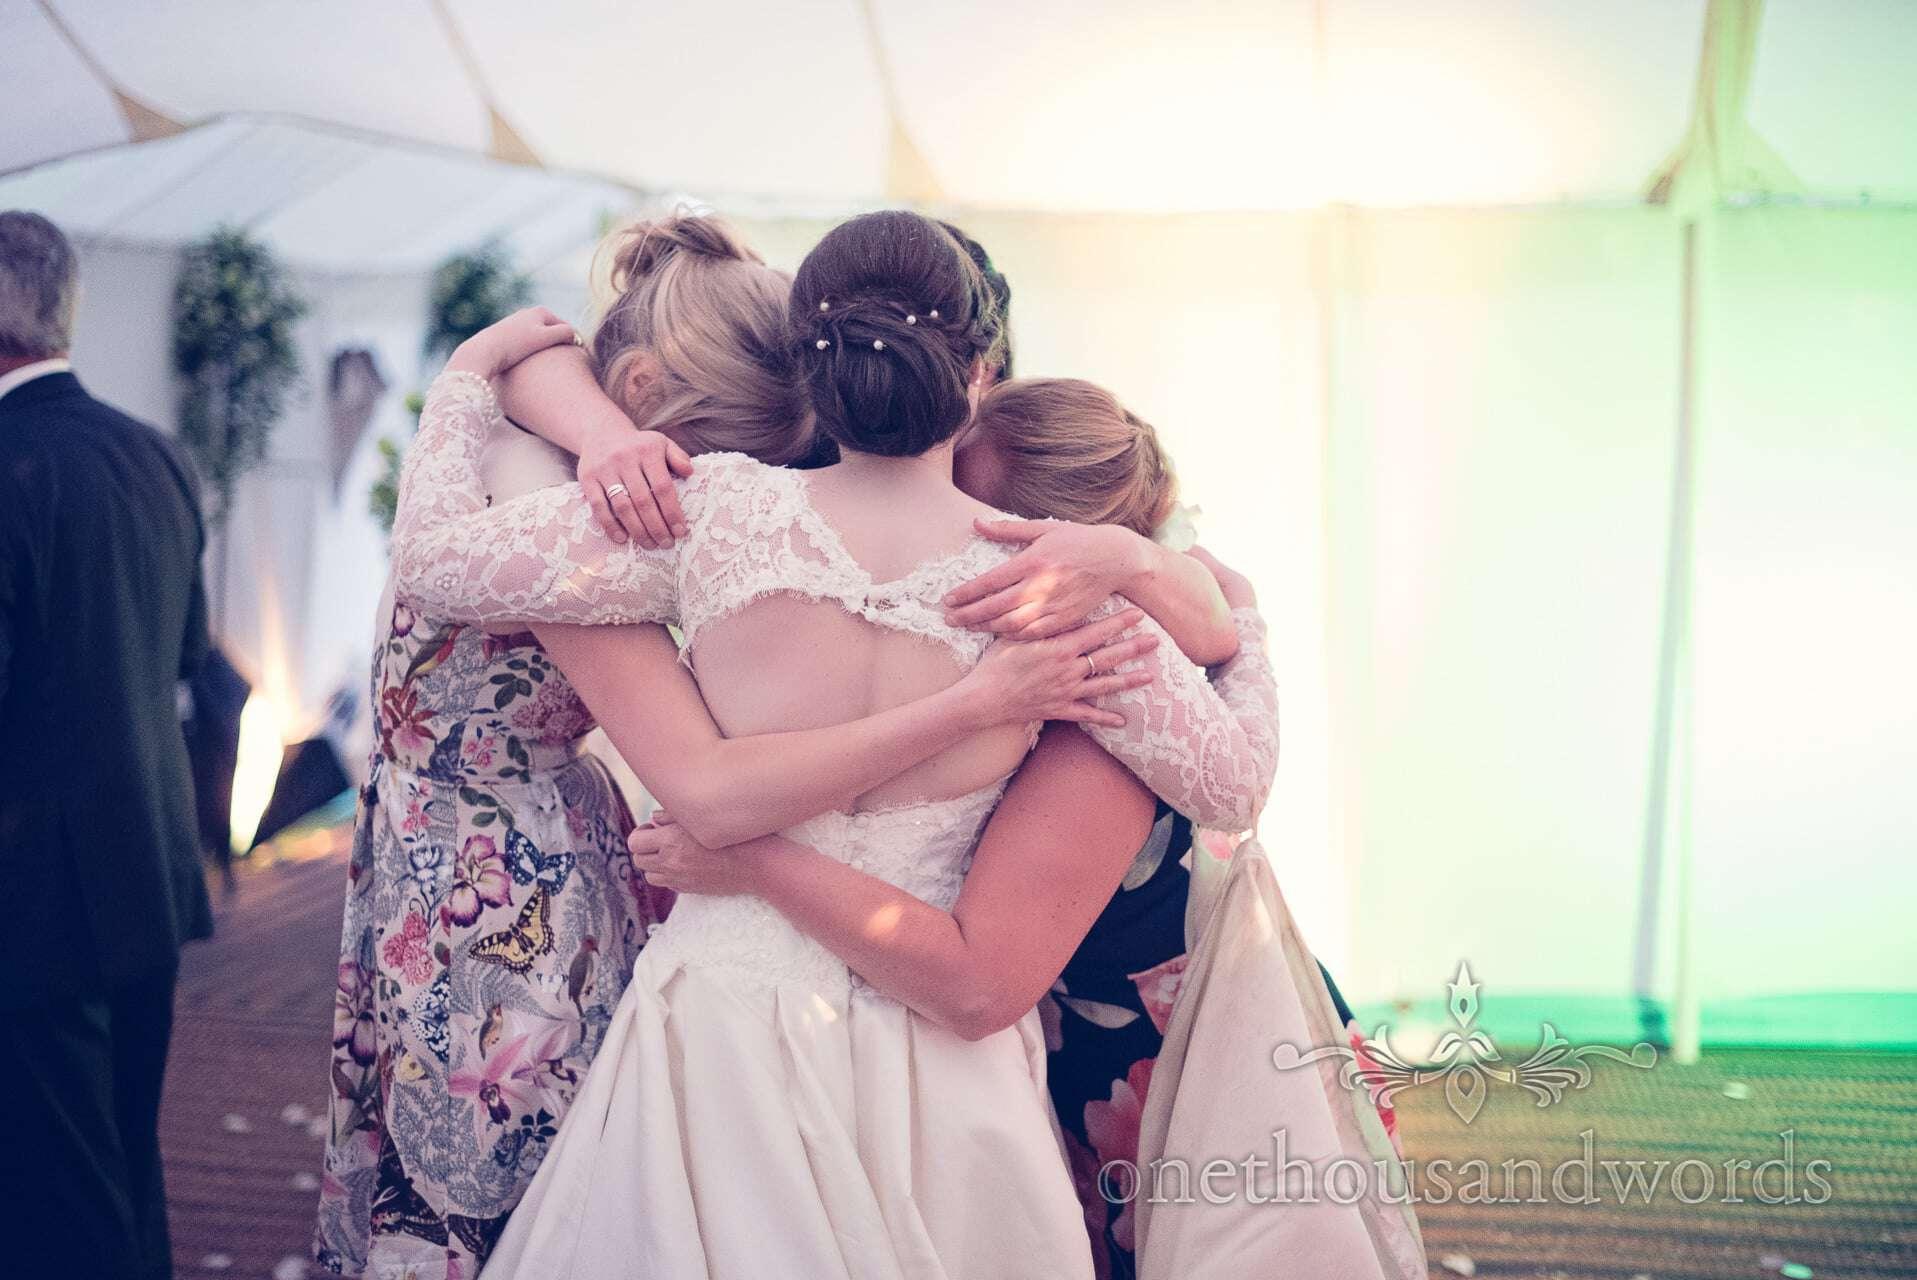 Bride hugs her friends at The Priory Wareham wedding